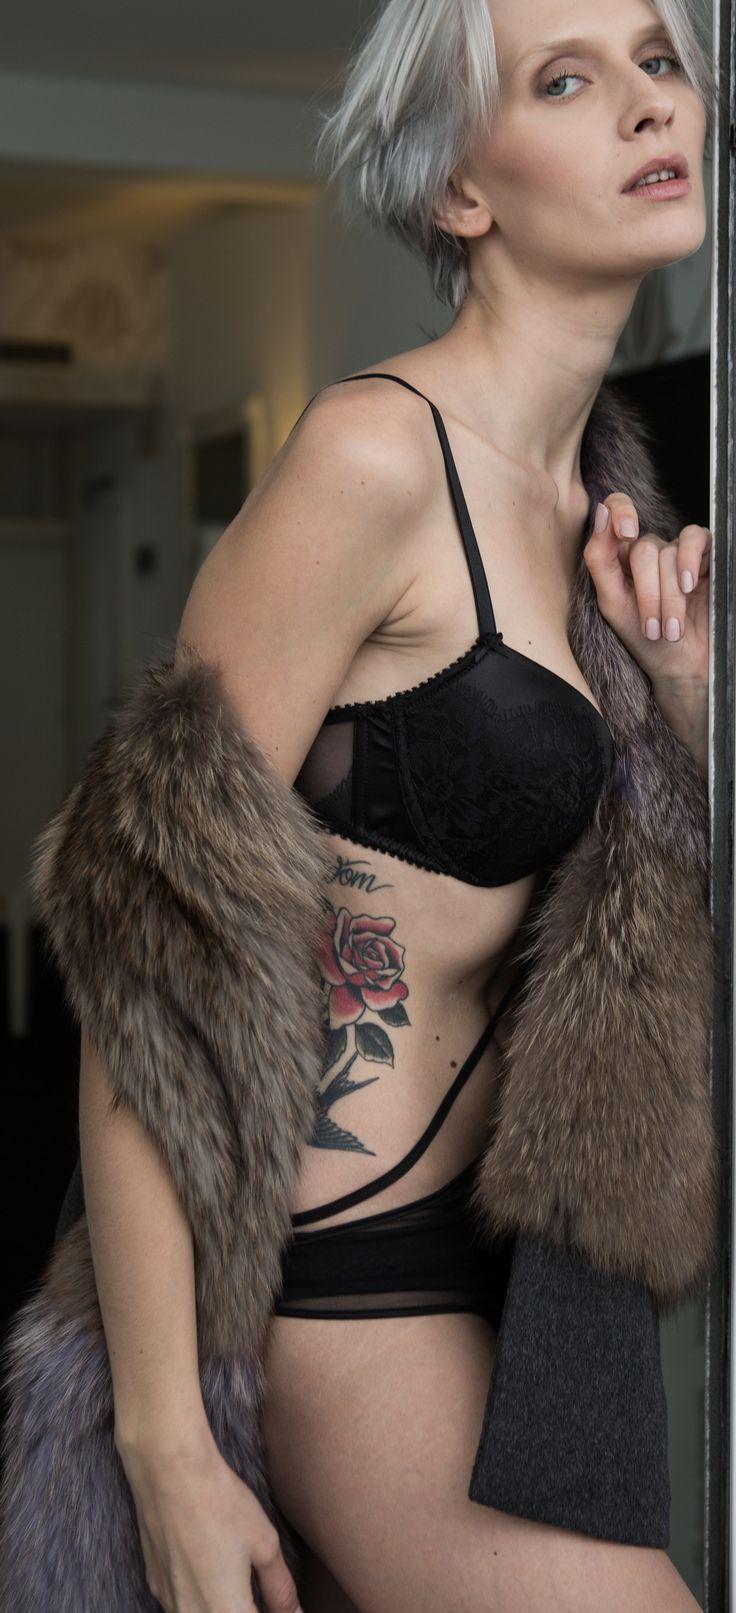 #grey #grigio #lingerie #black #nero #photo #moments #attimi #monicapallonifotografa #tatoo #flowers #rosa #tatuaggio #furcoat